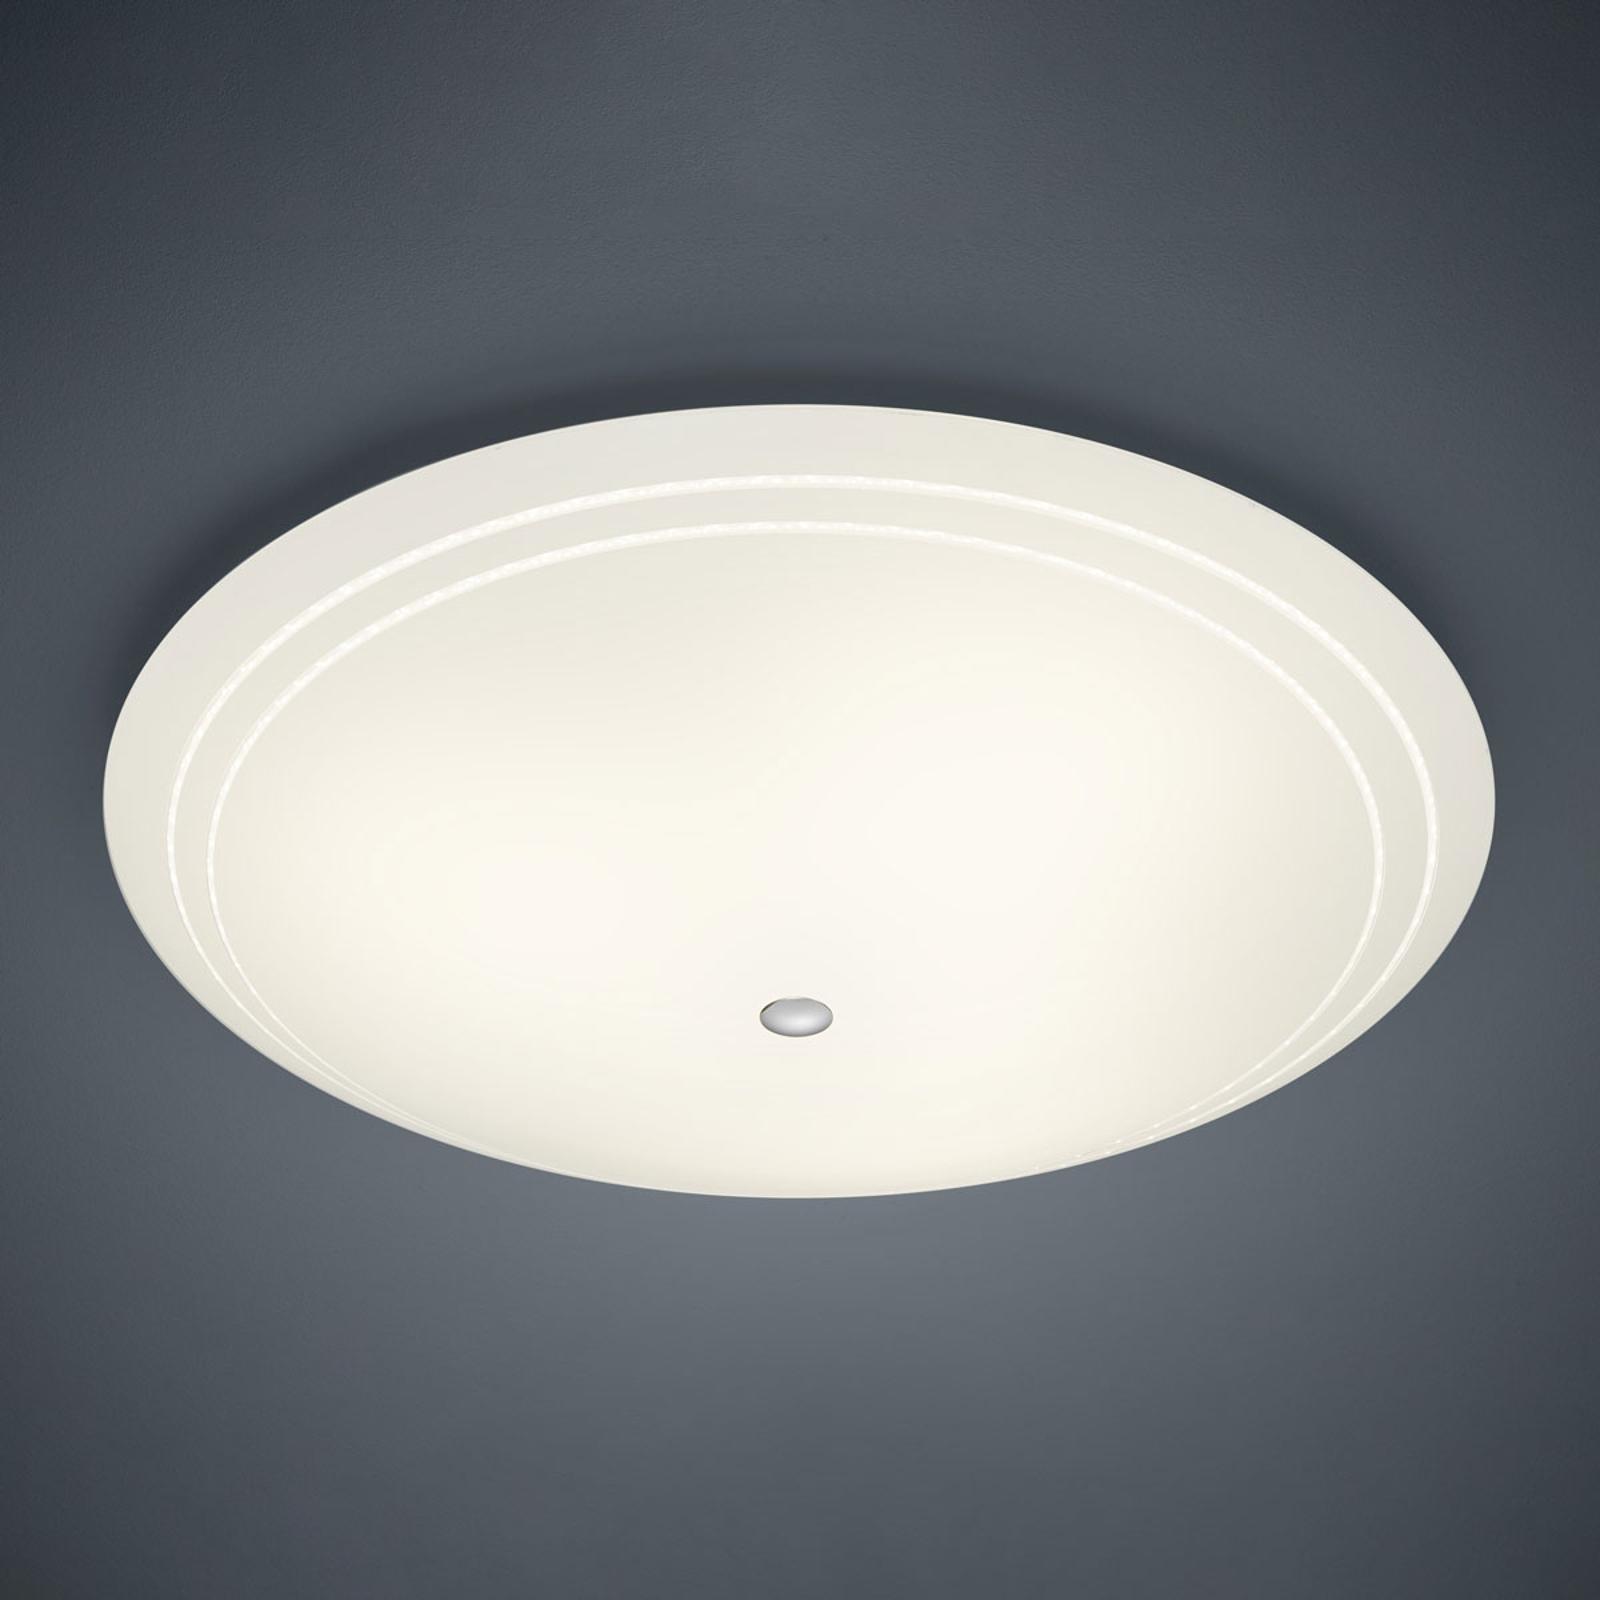 BANKAMP Yanis lampa sufitowa LED szkło, Ø 82 cm